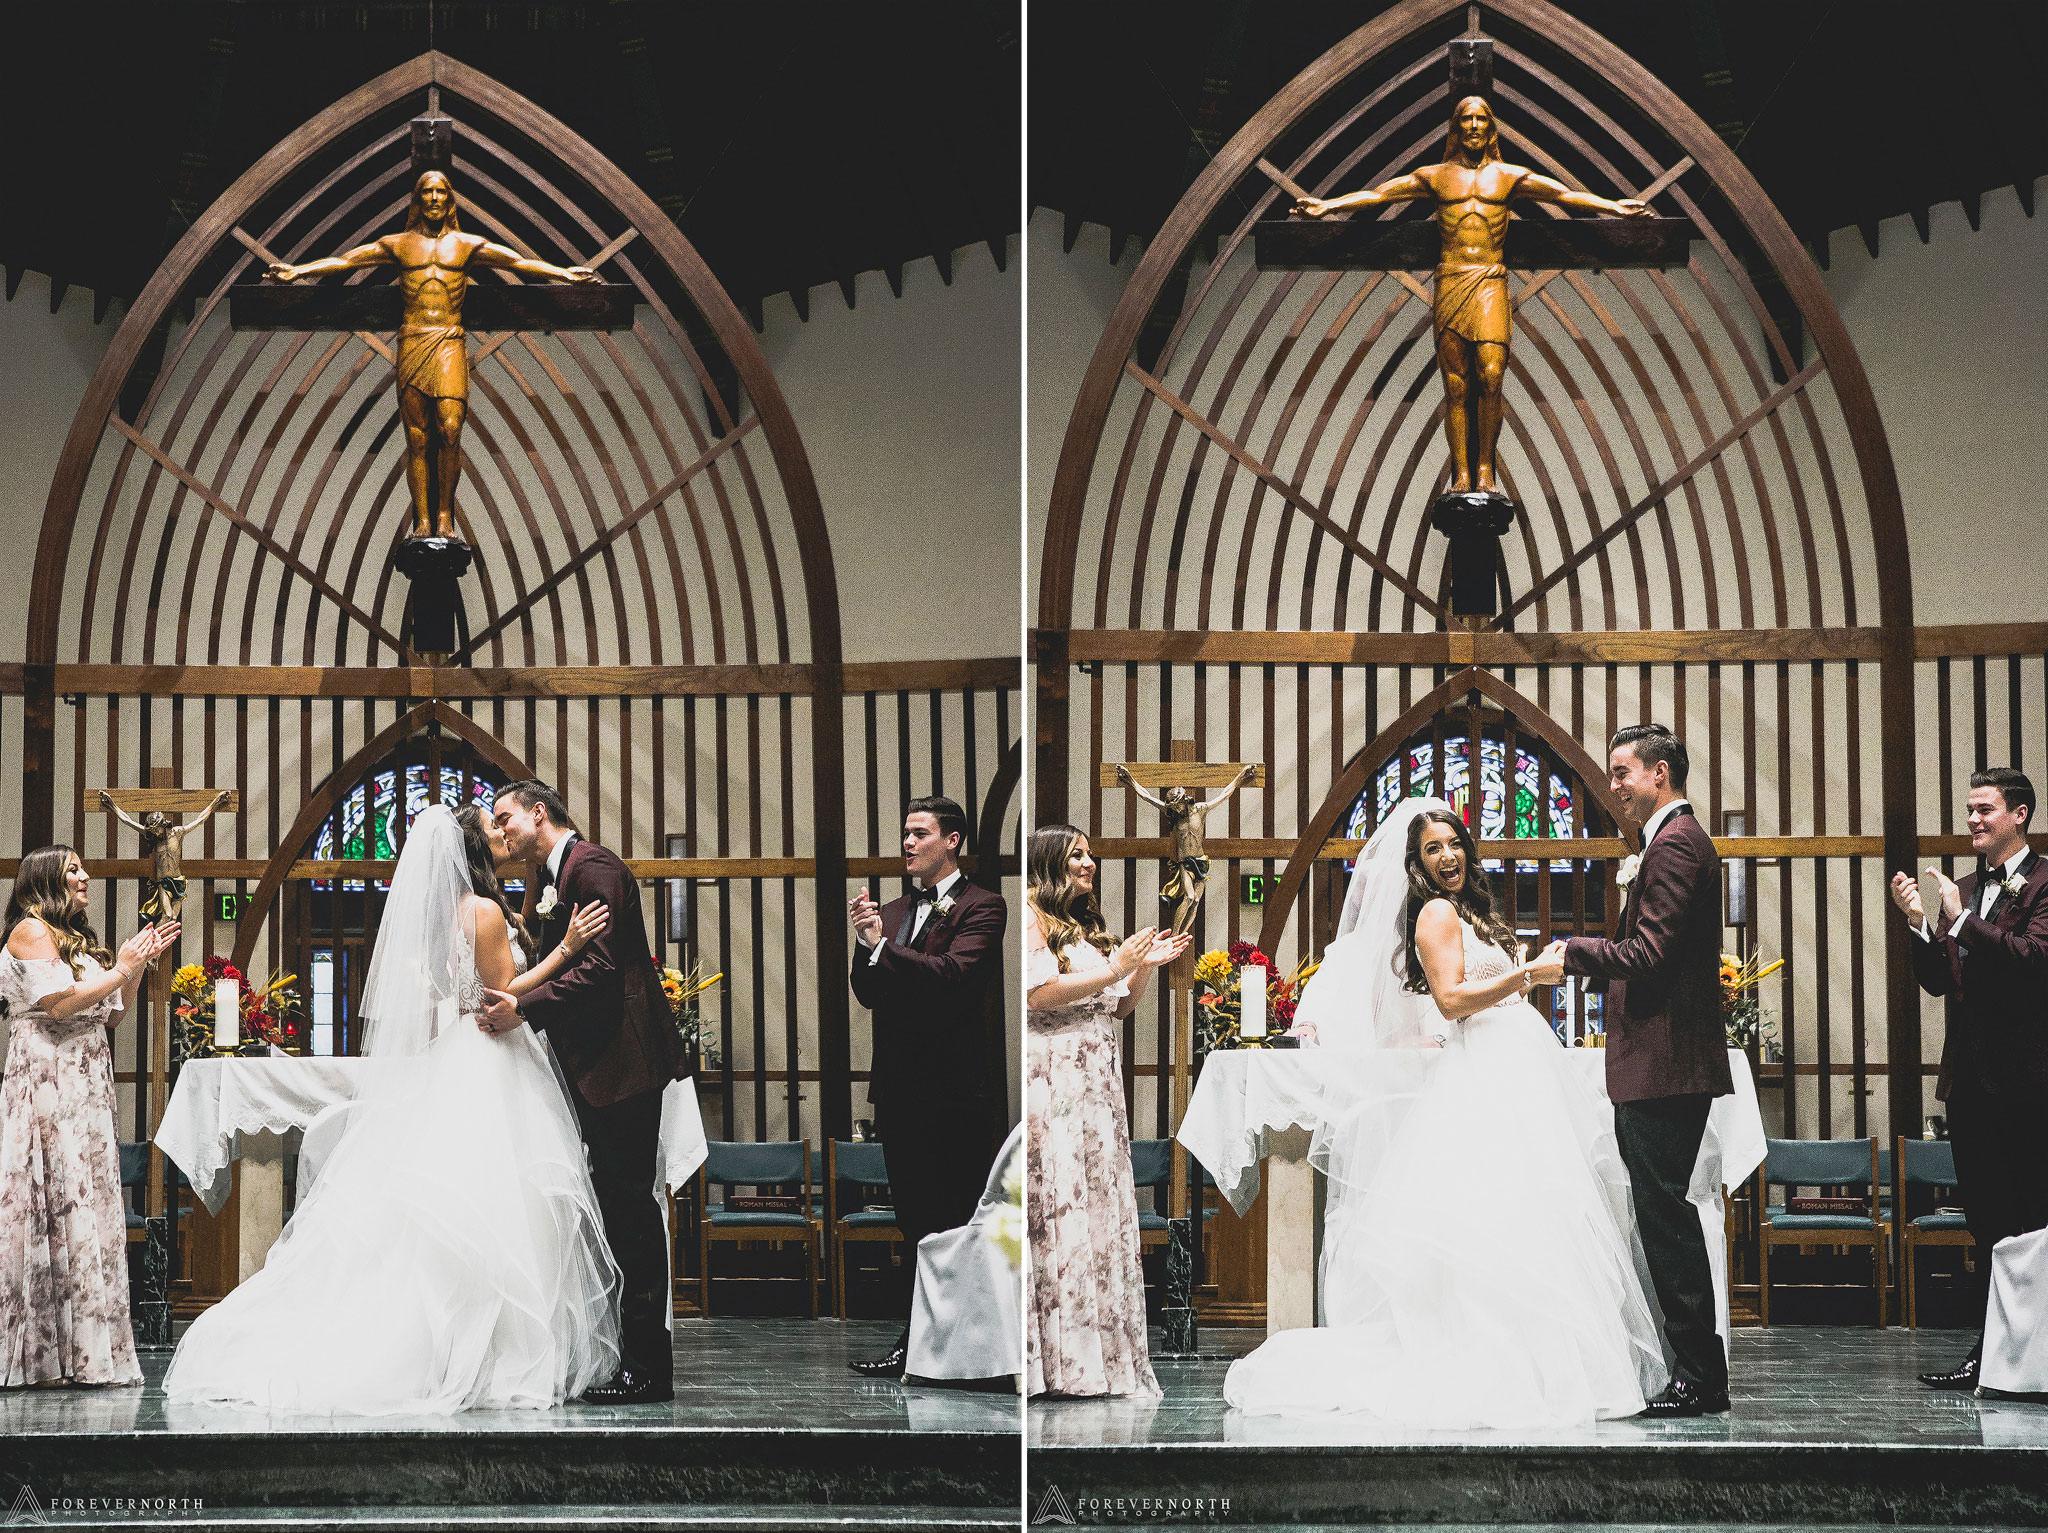 Bergersen-Bethpage-Wedding-Photographer-44.JPG